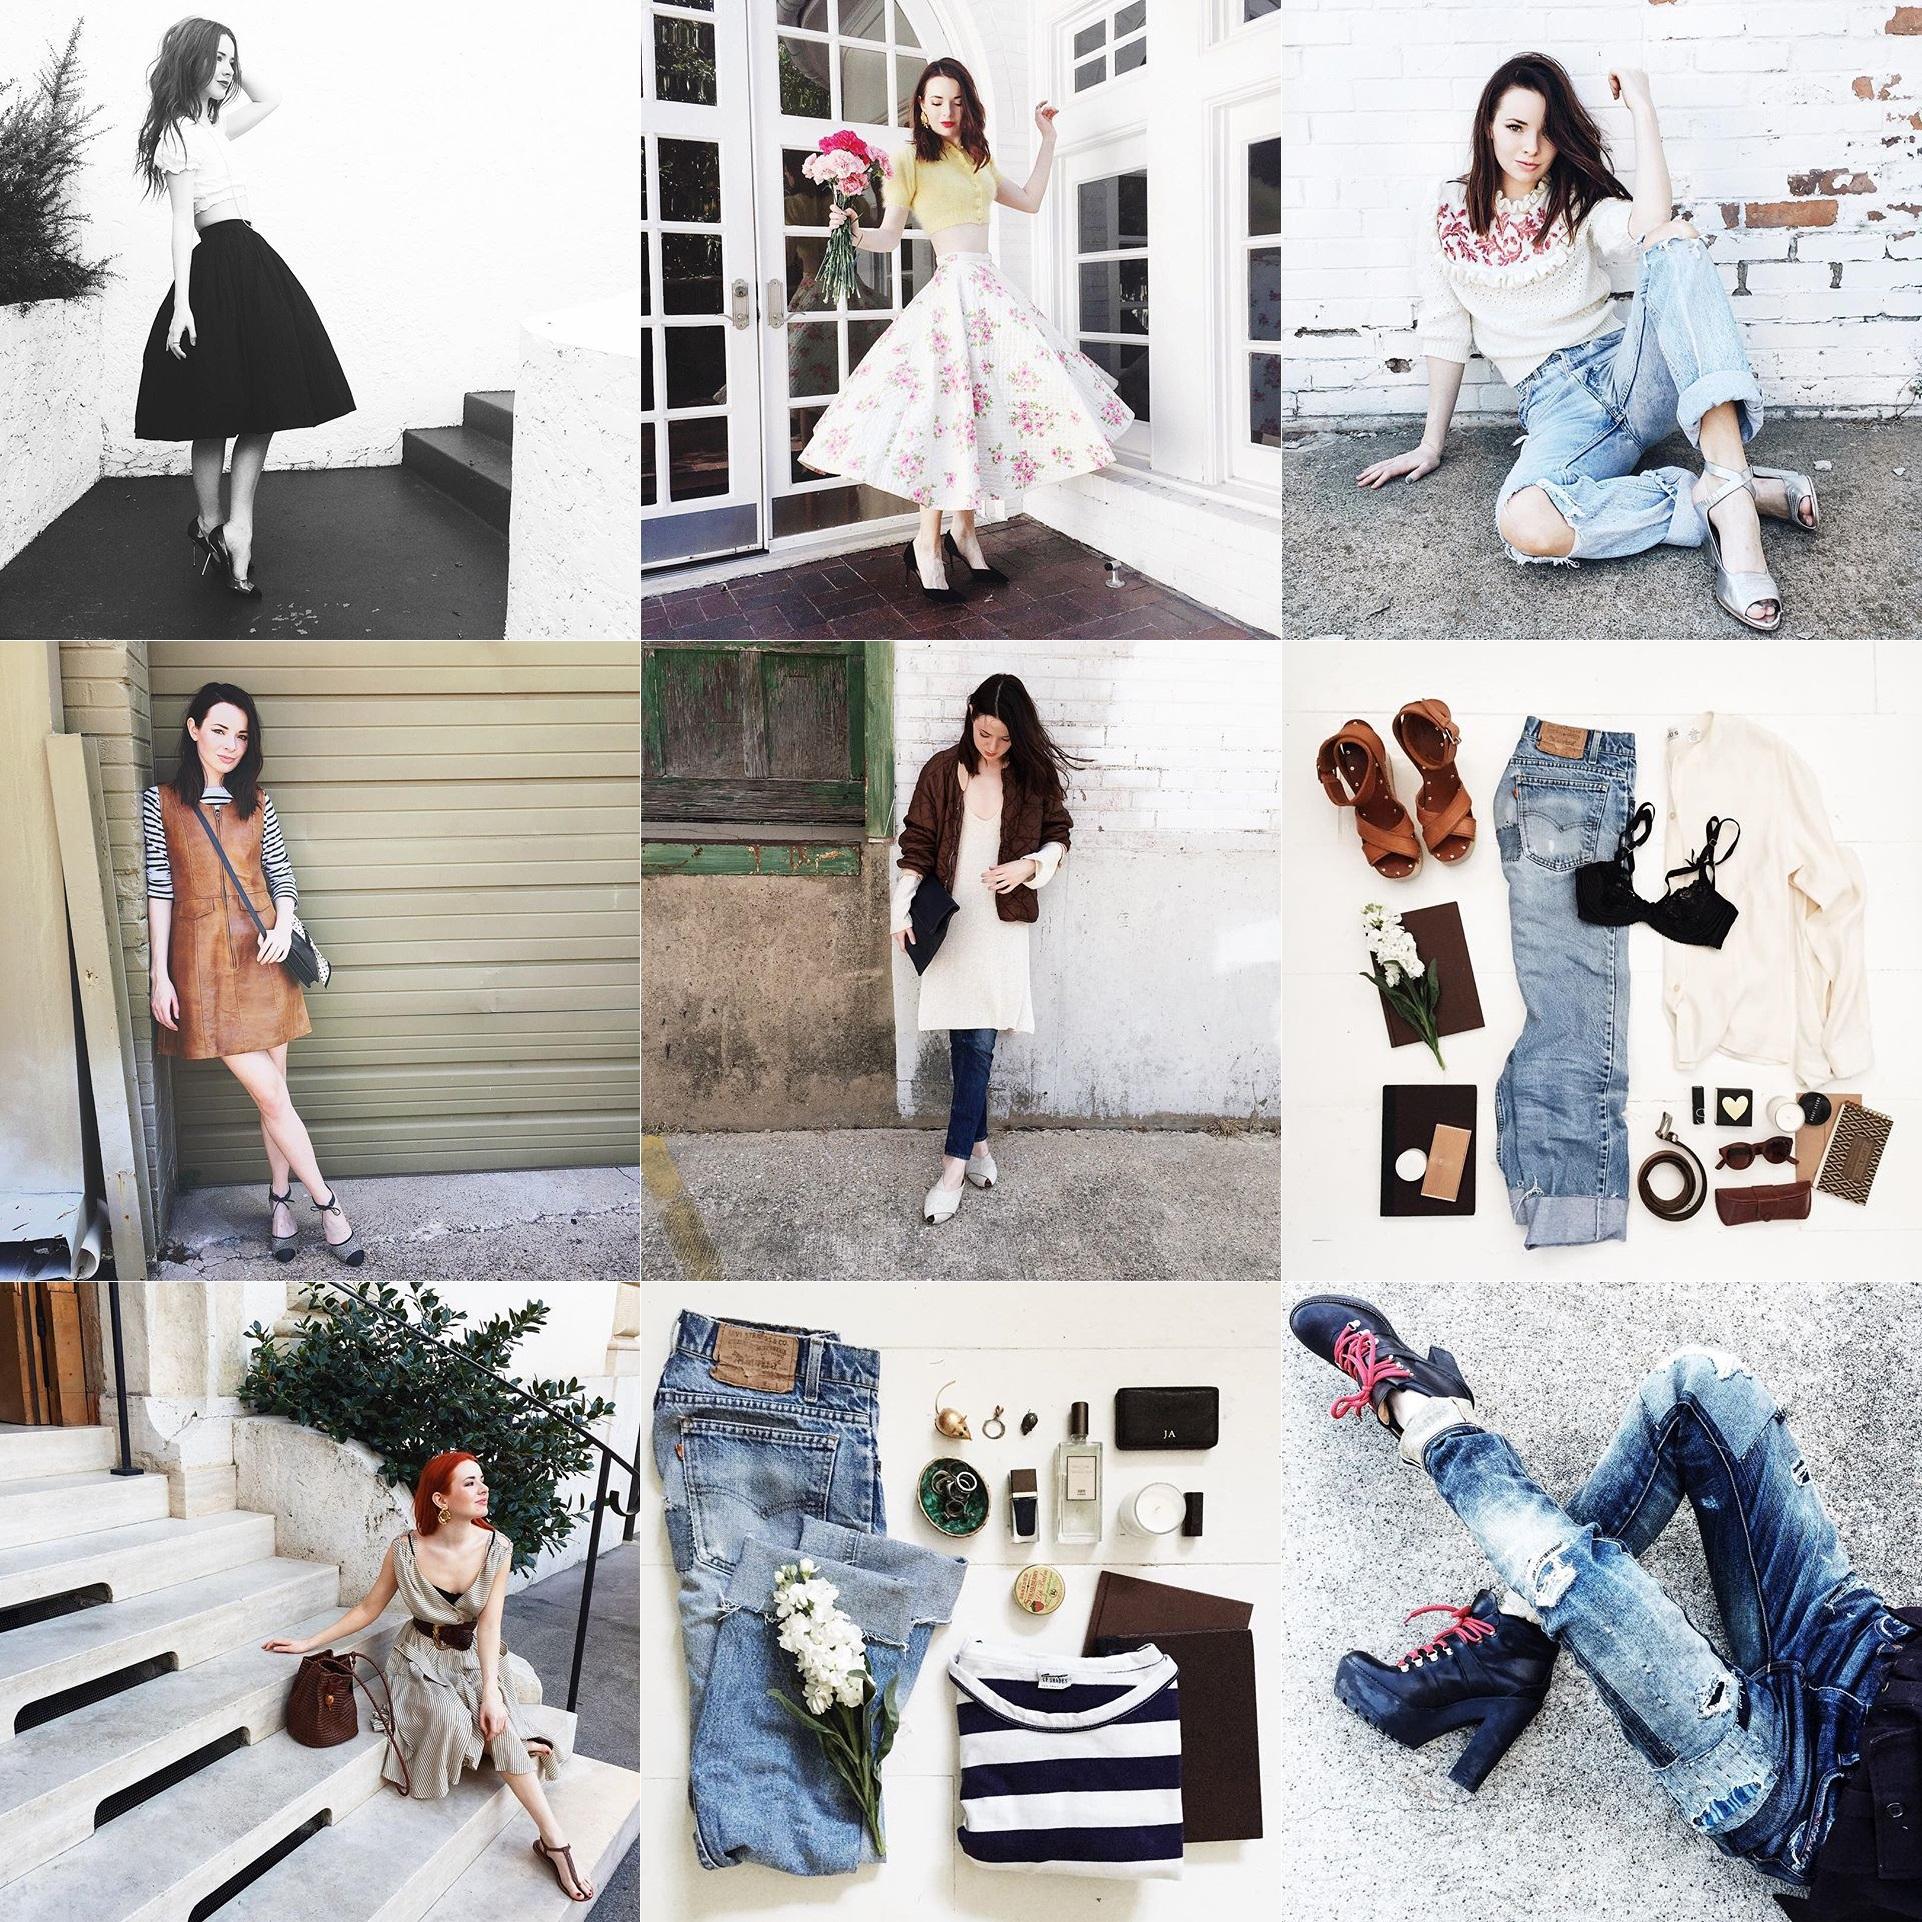 instagram-seguir-jenni